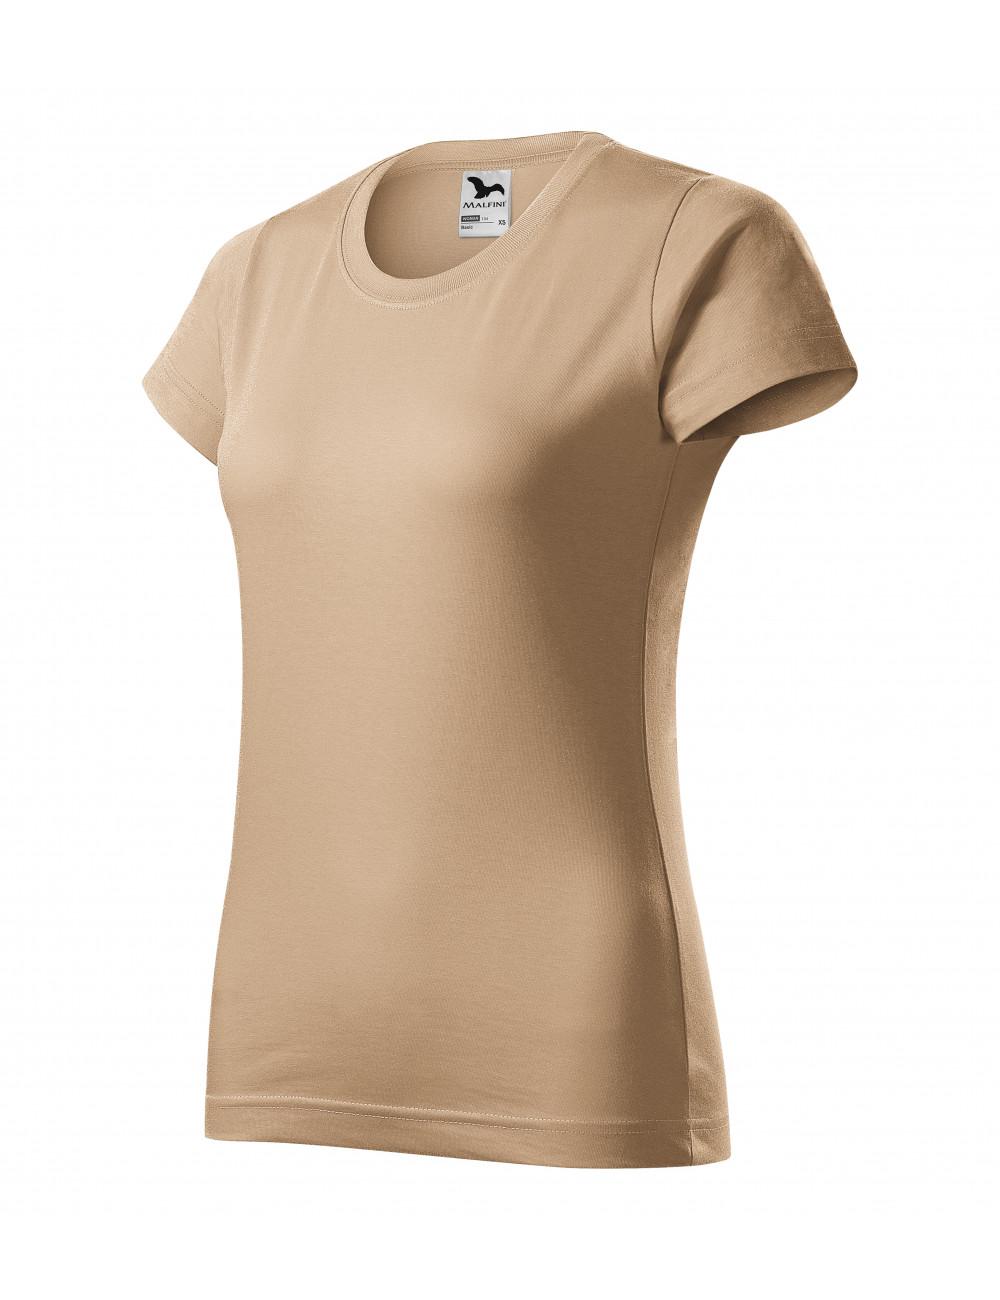 Adler MALFINI Koszulka damska Basic 134 piaskowy